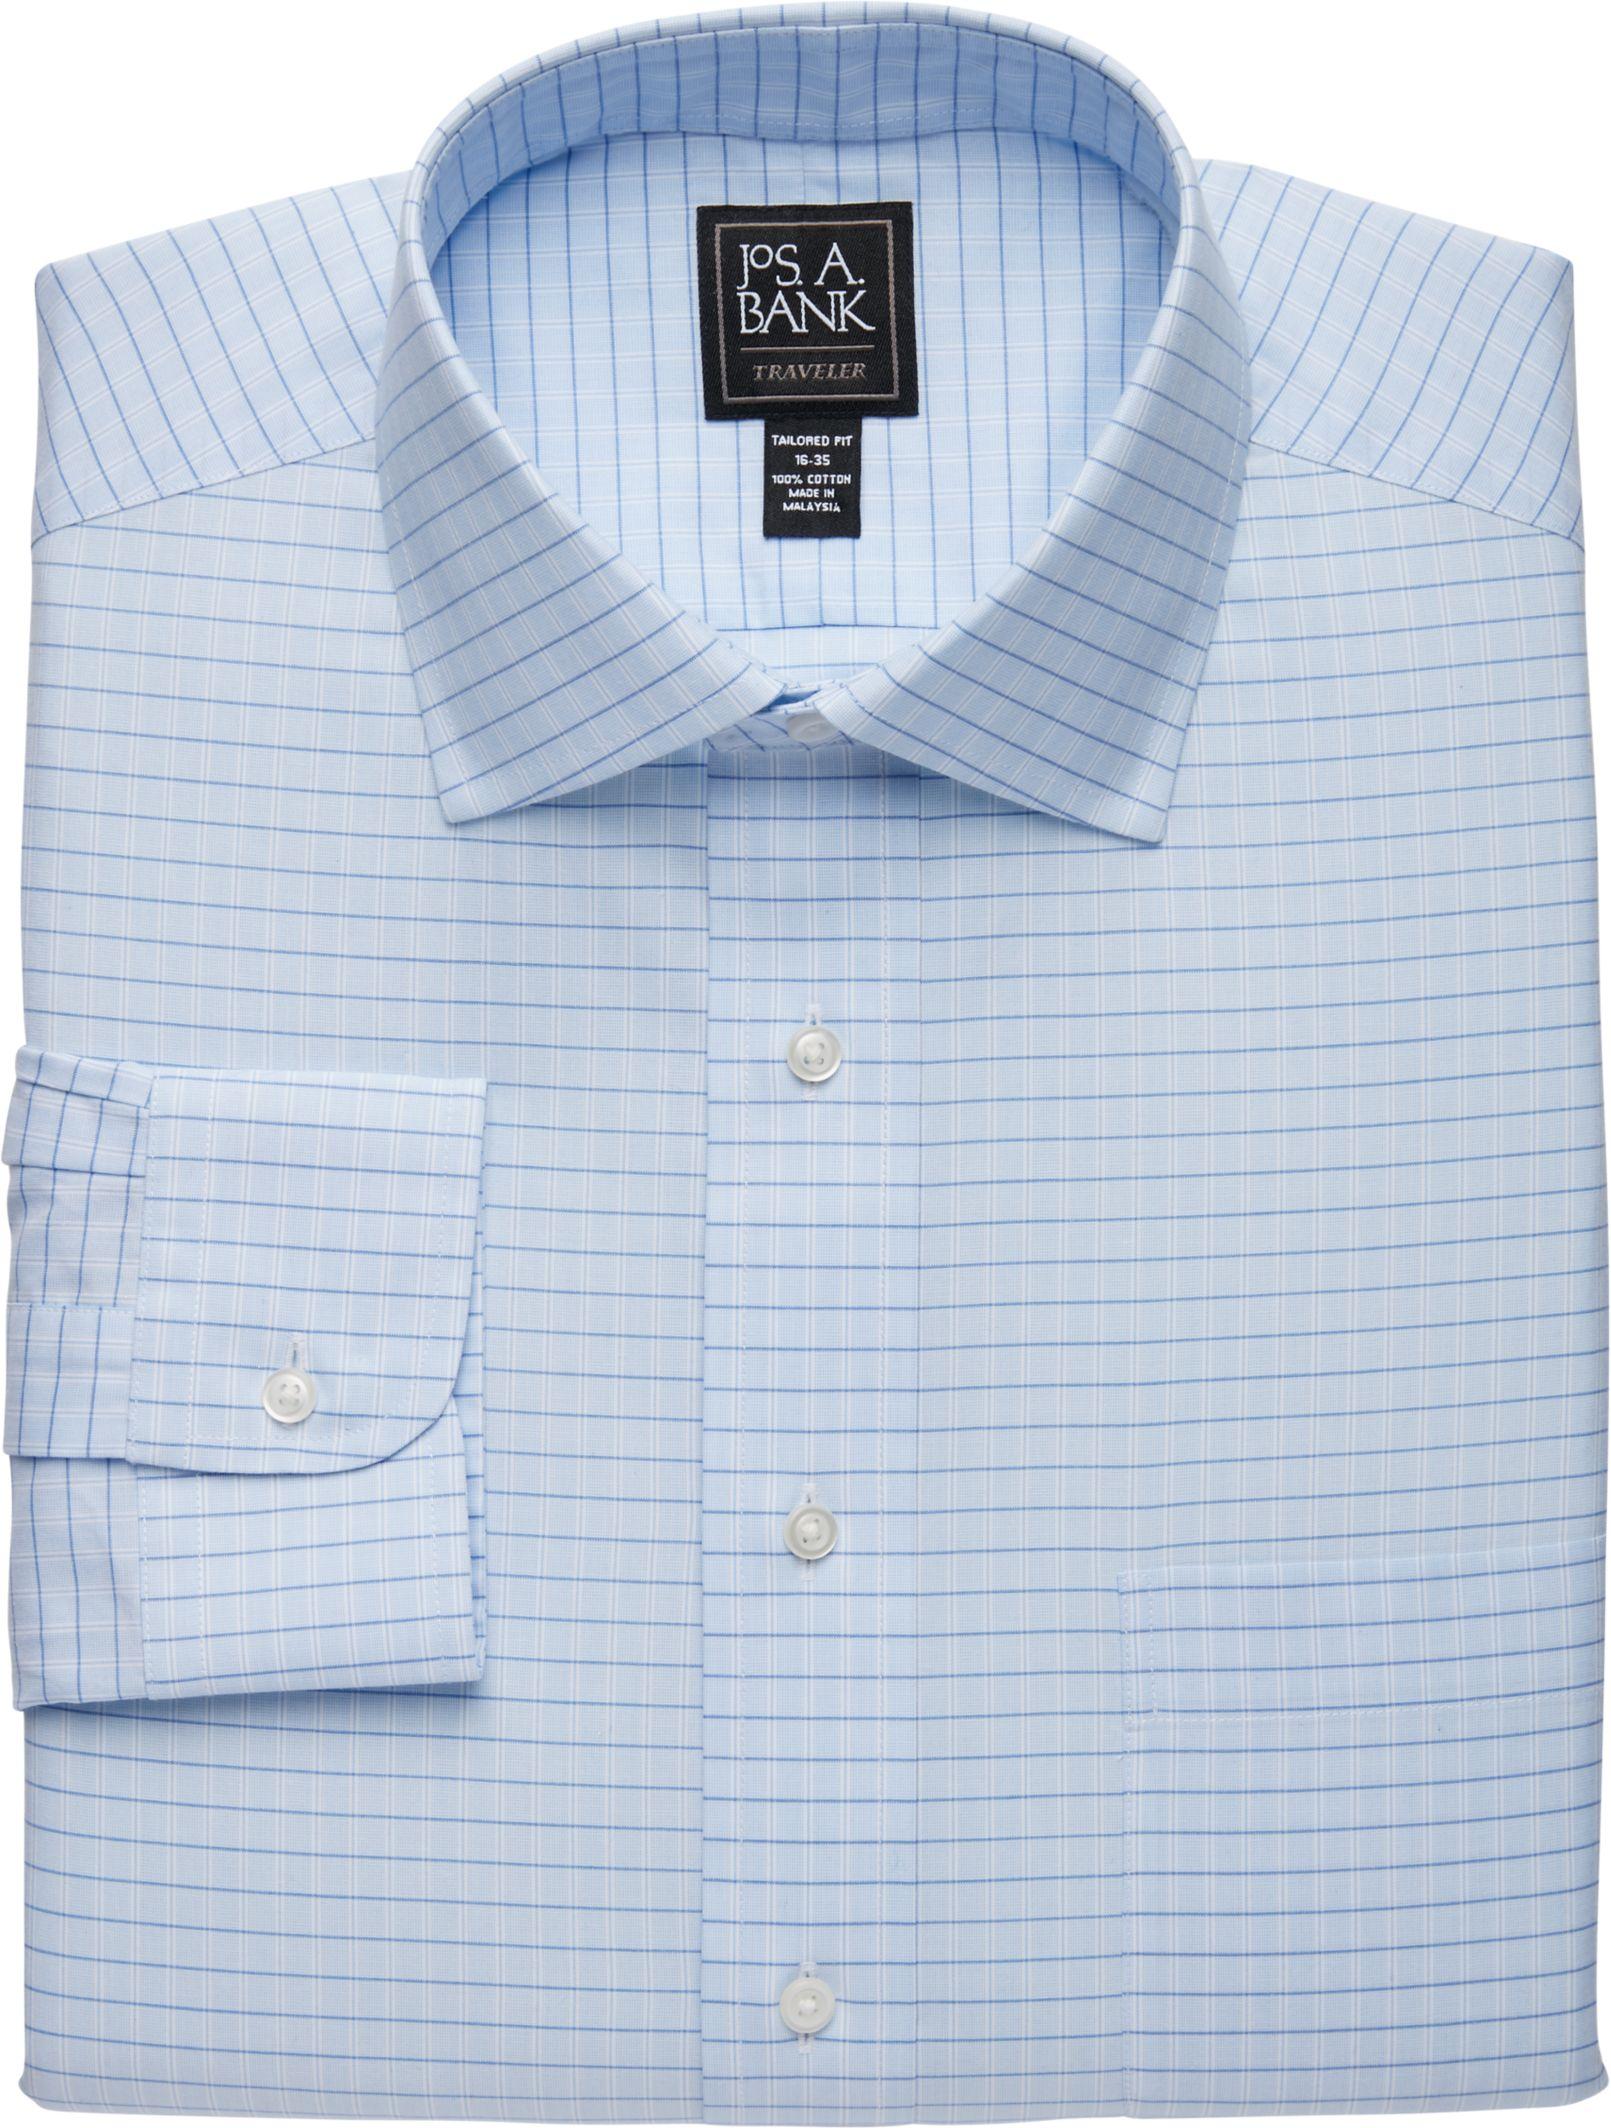 2eca281d13f7 Traveler Collection Tailored Fit Spread Collar Plaid Dress Shirt - Big &  Tall #57CK